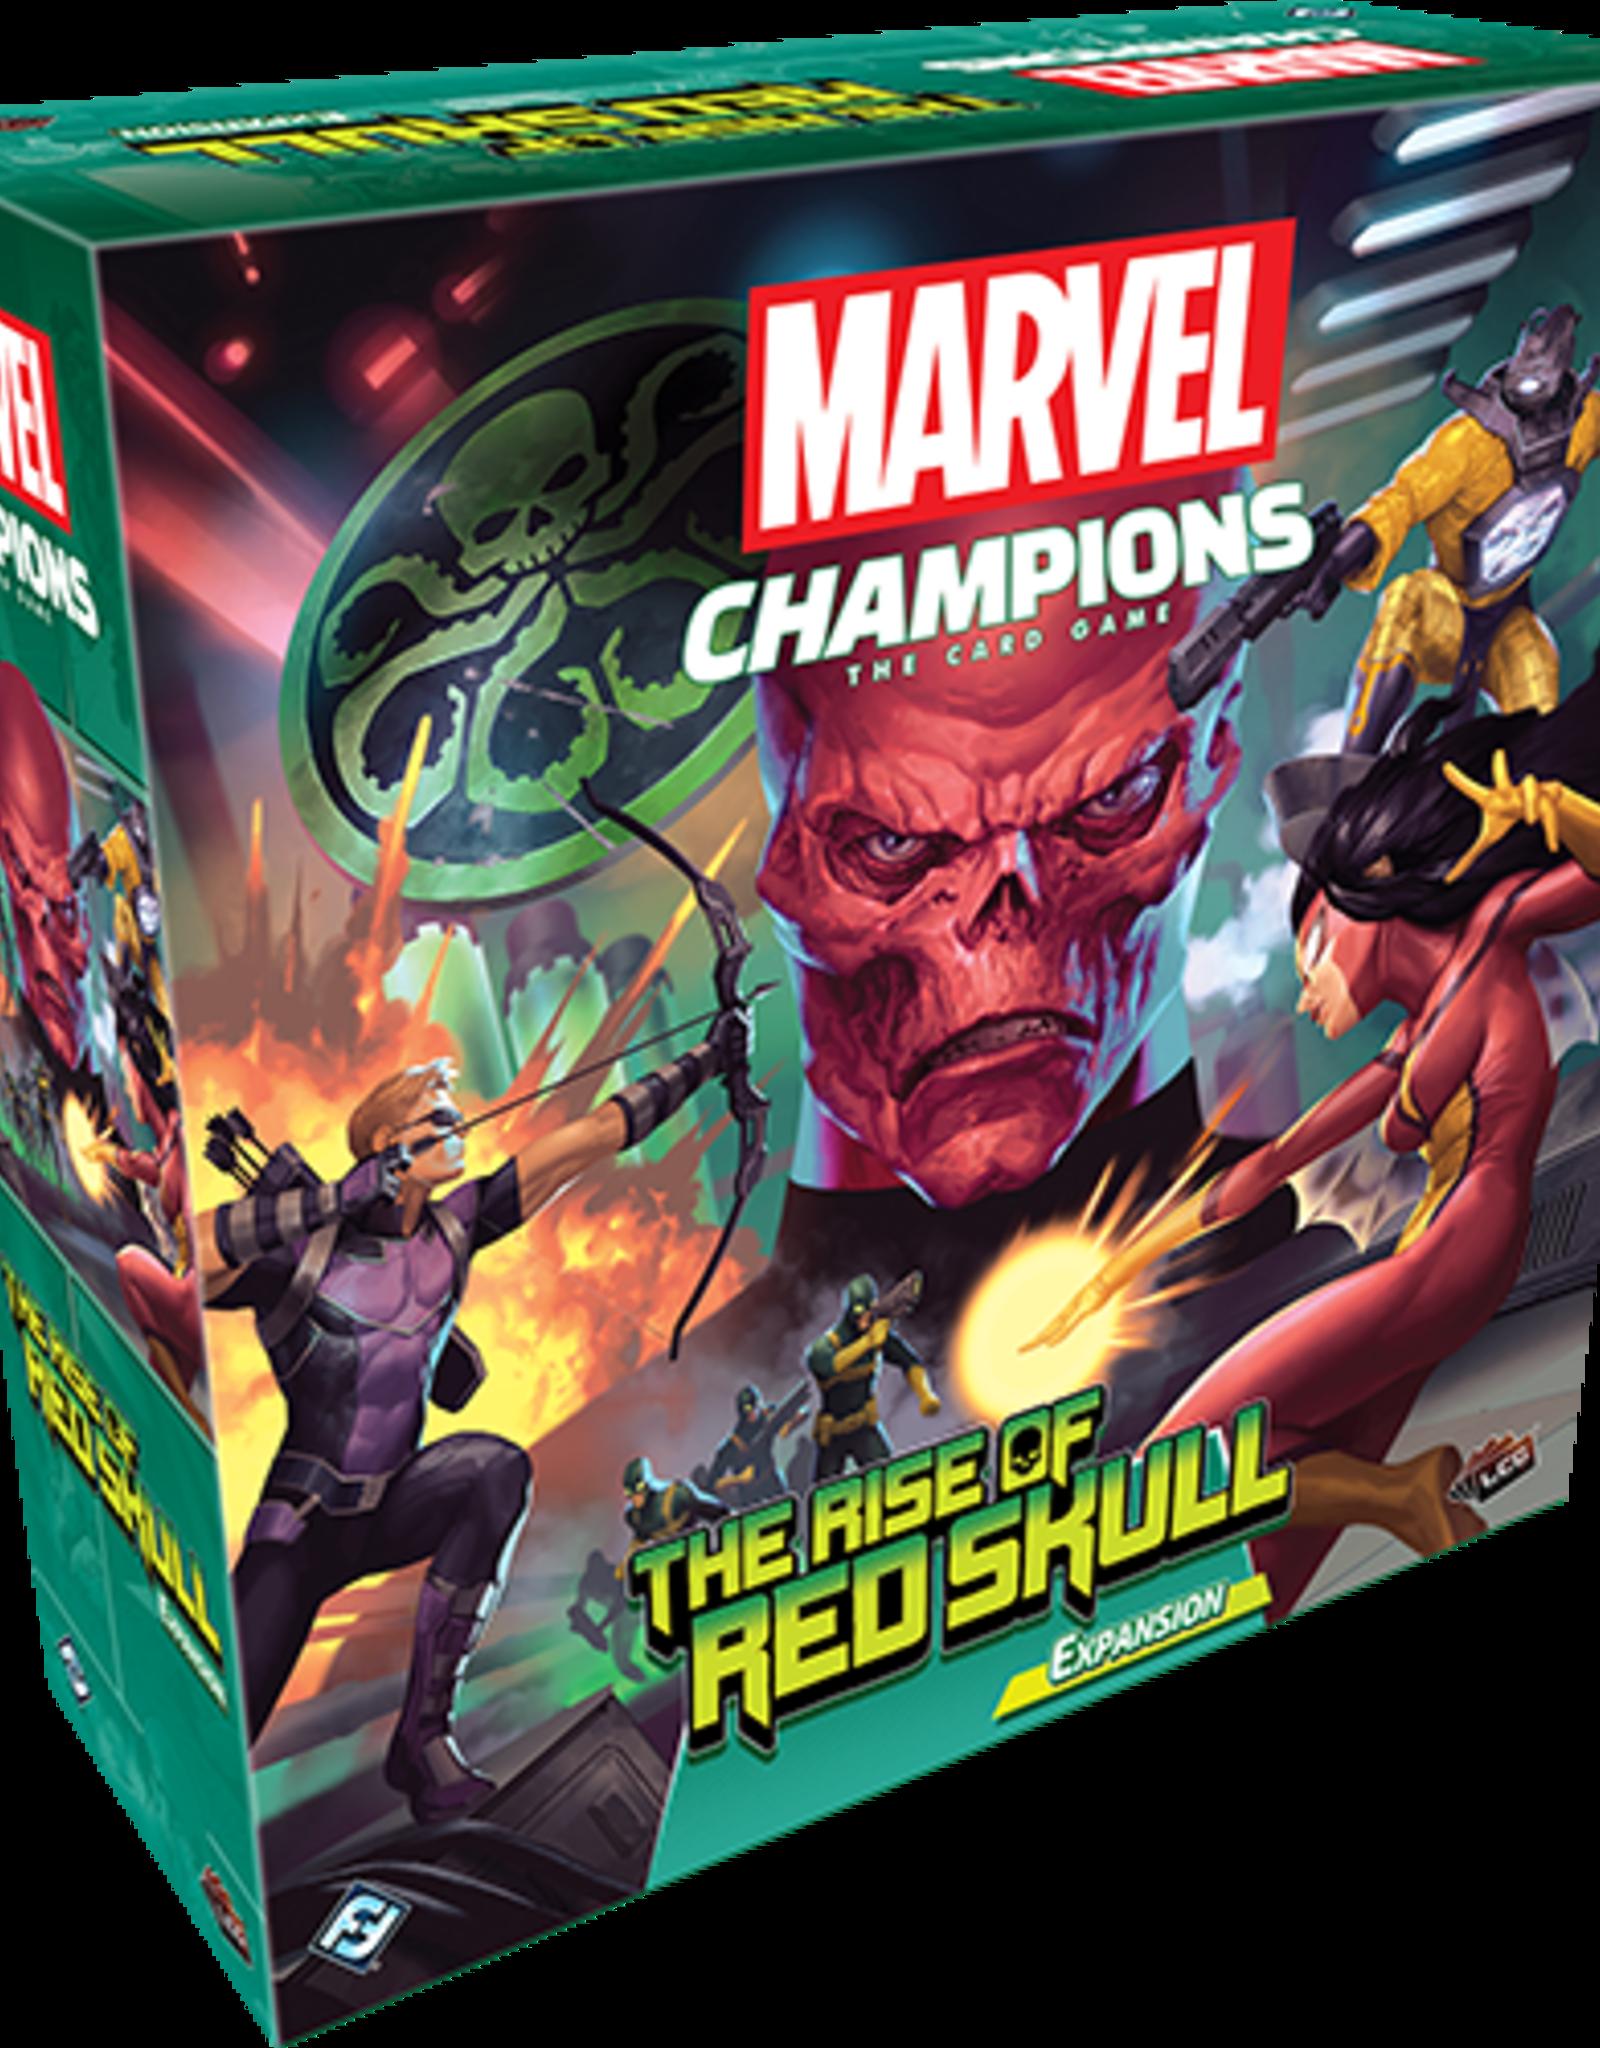 FFG Marvel Champions: The Rise of Red Skull